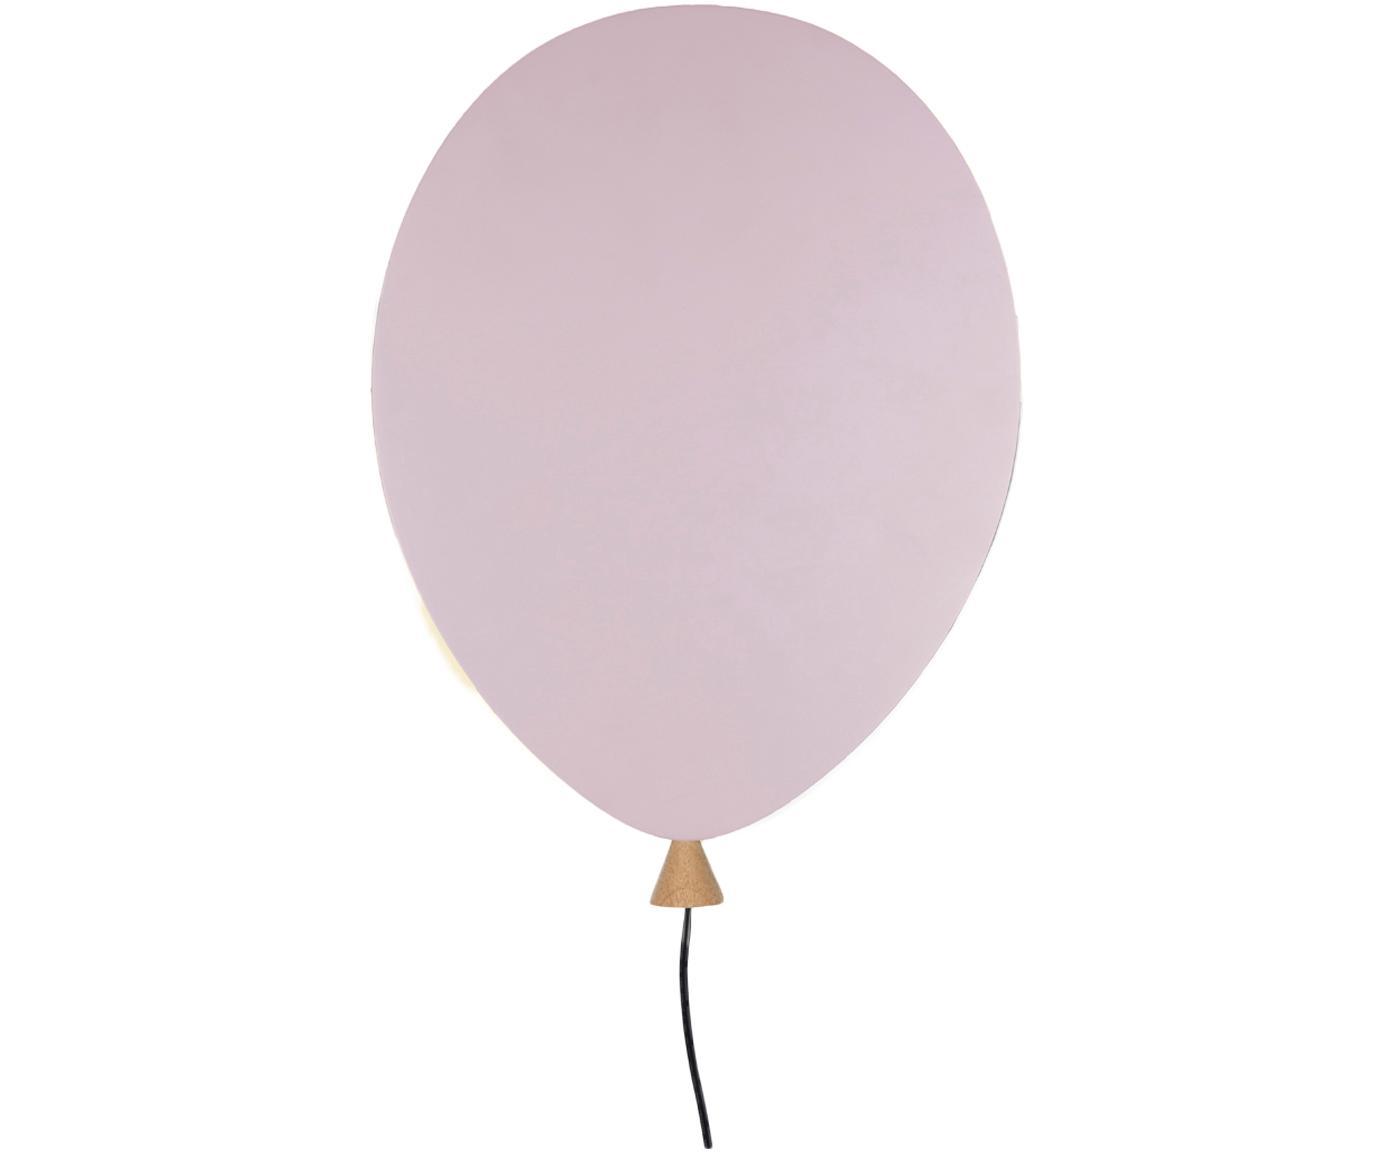 Wandlamp Balloon met stekker, Lampenkap: gecoat hout, Roze, 25 x 35 cm